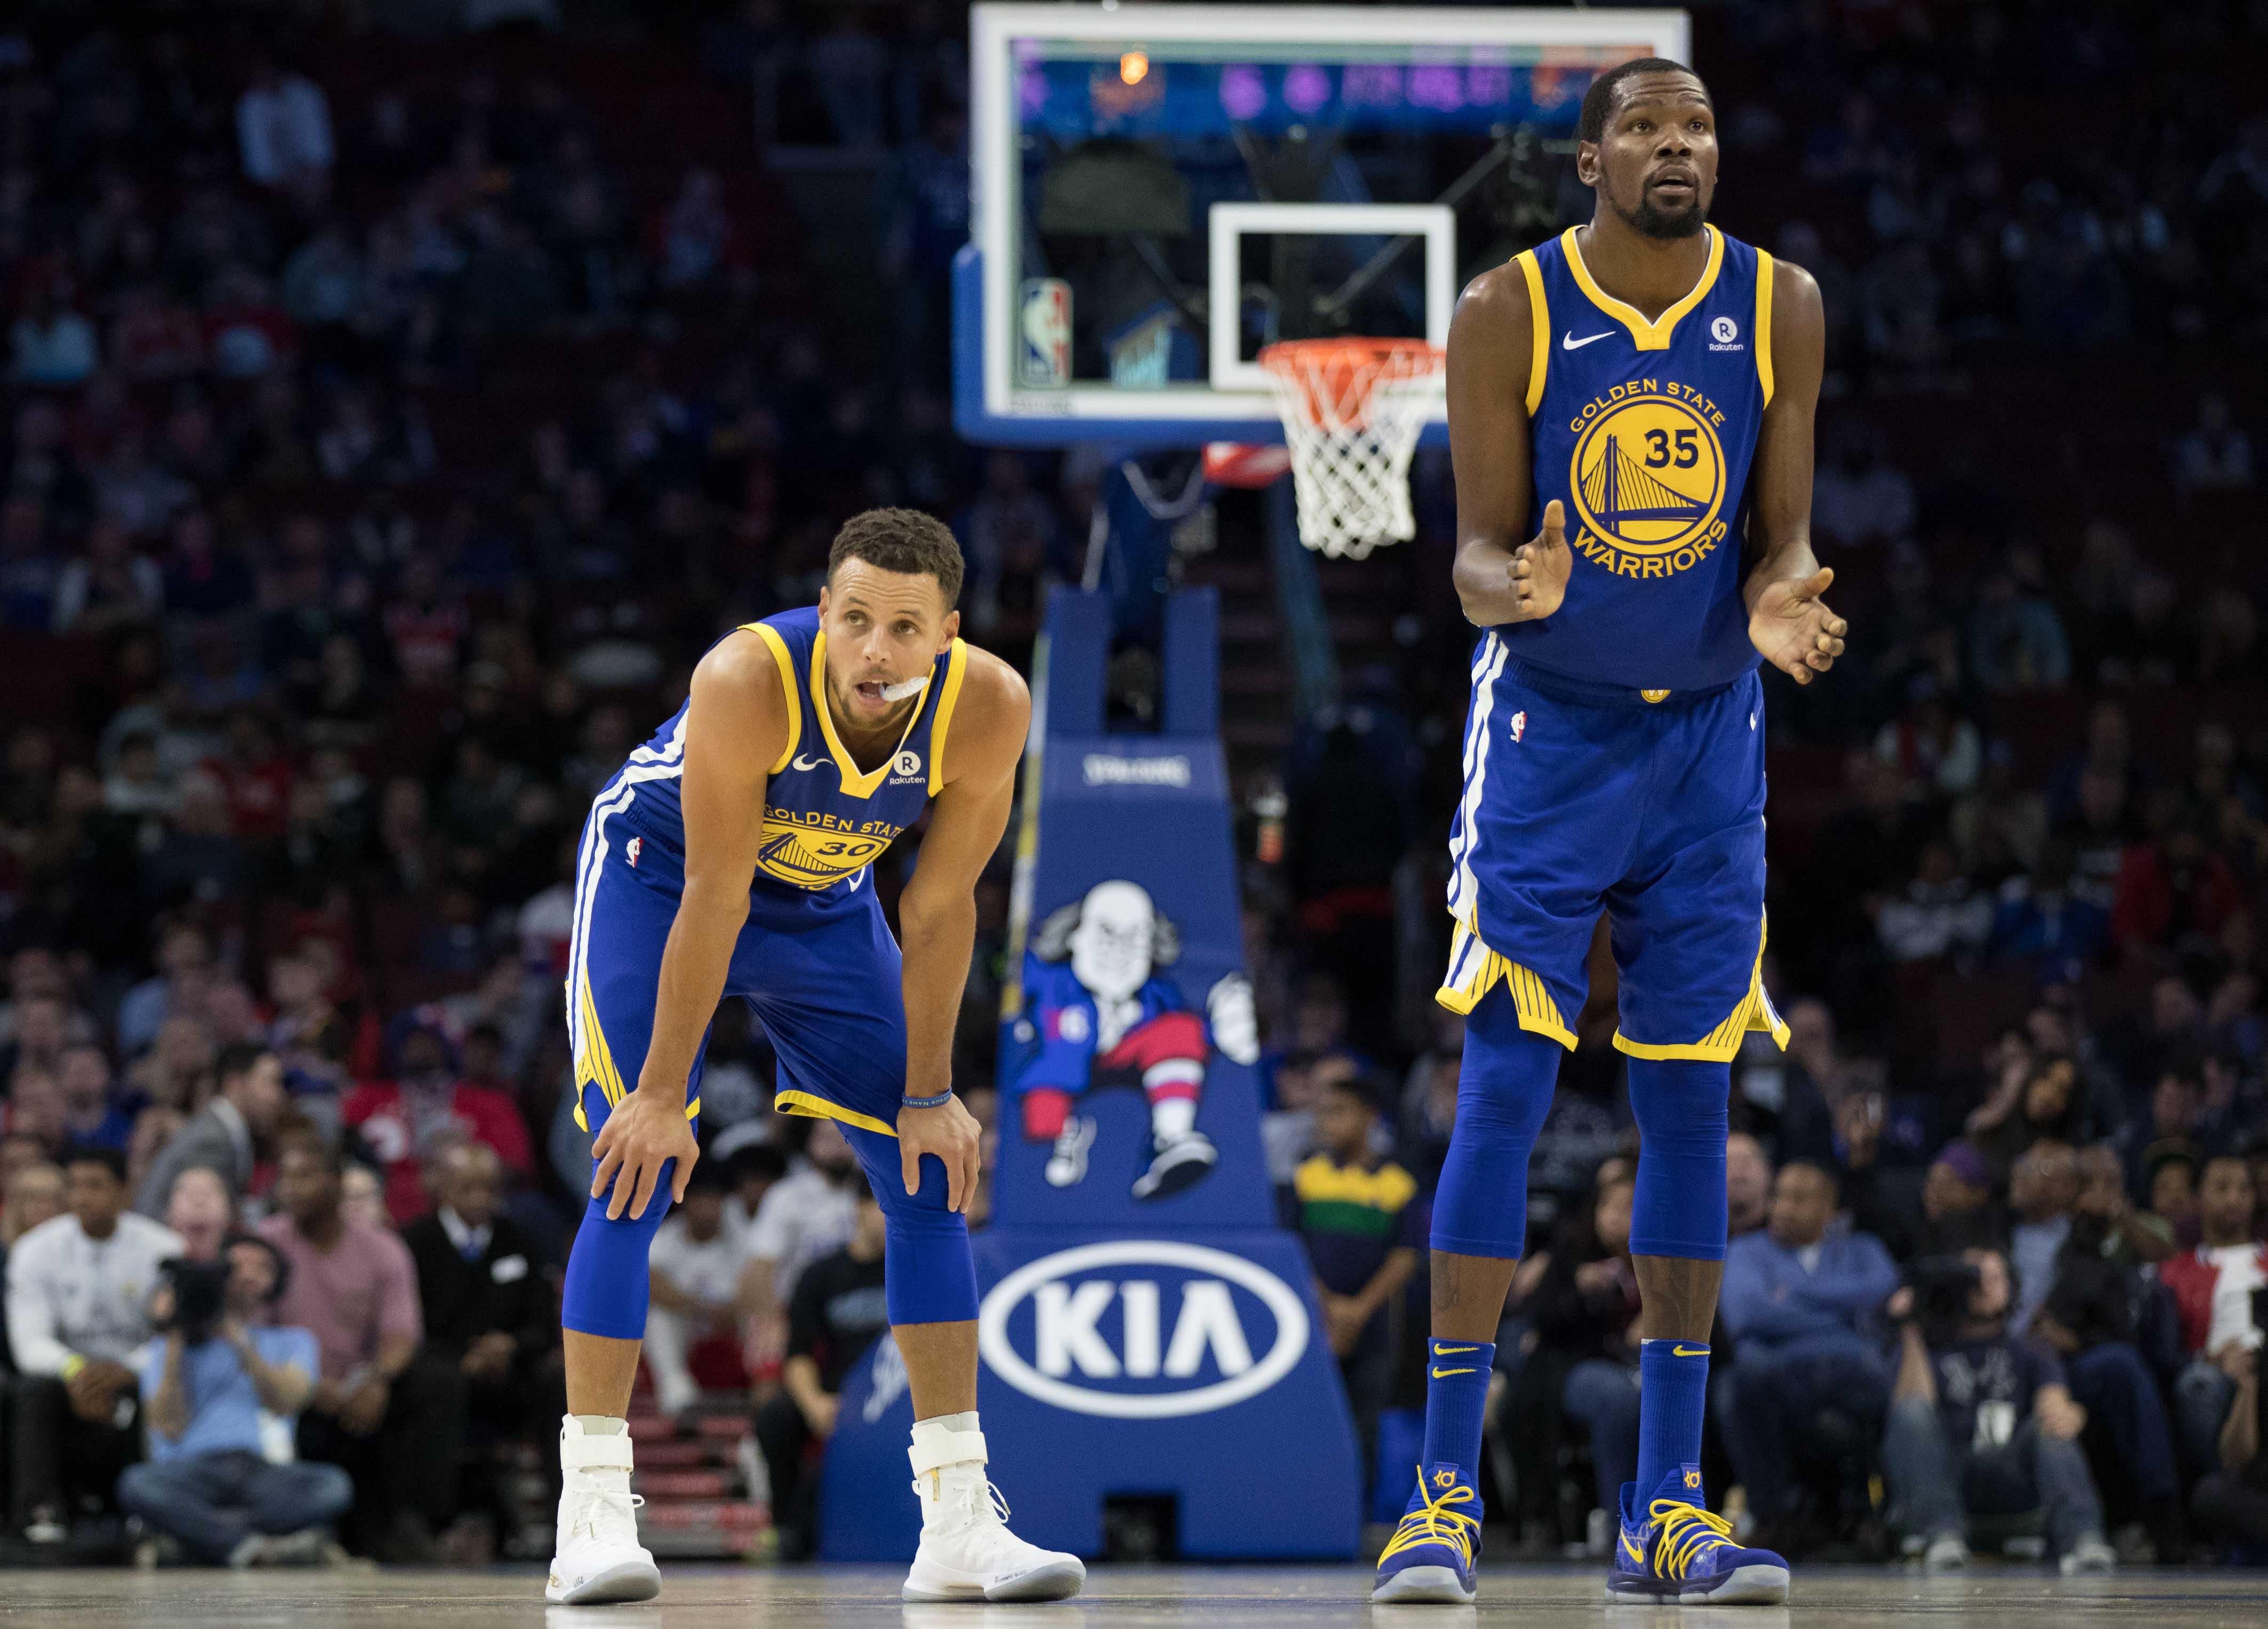 NBA: Golden State Warriors at Philadelphia 76ers